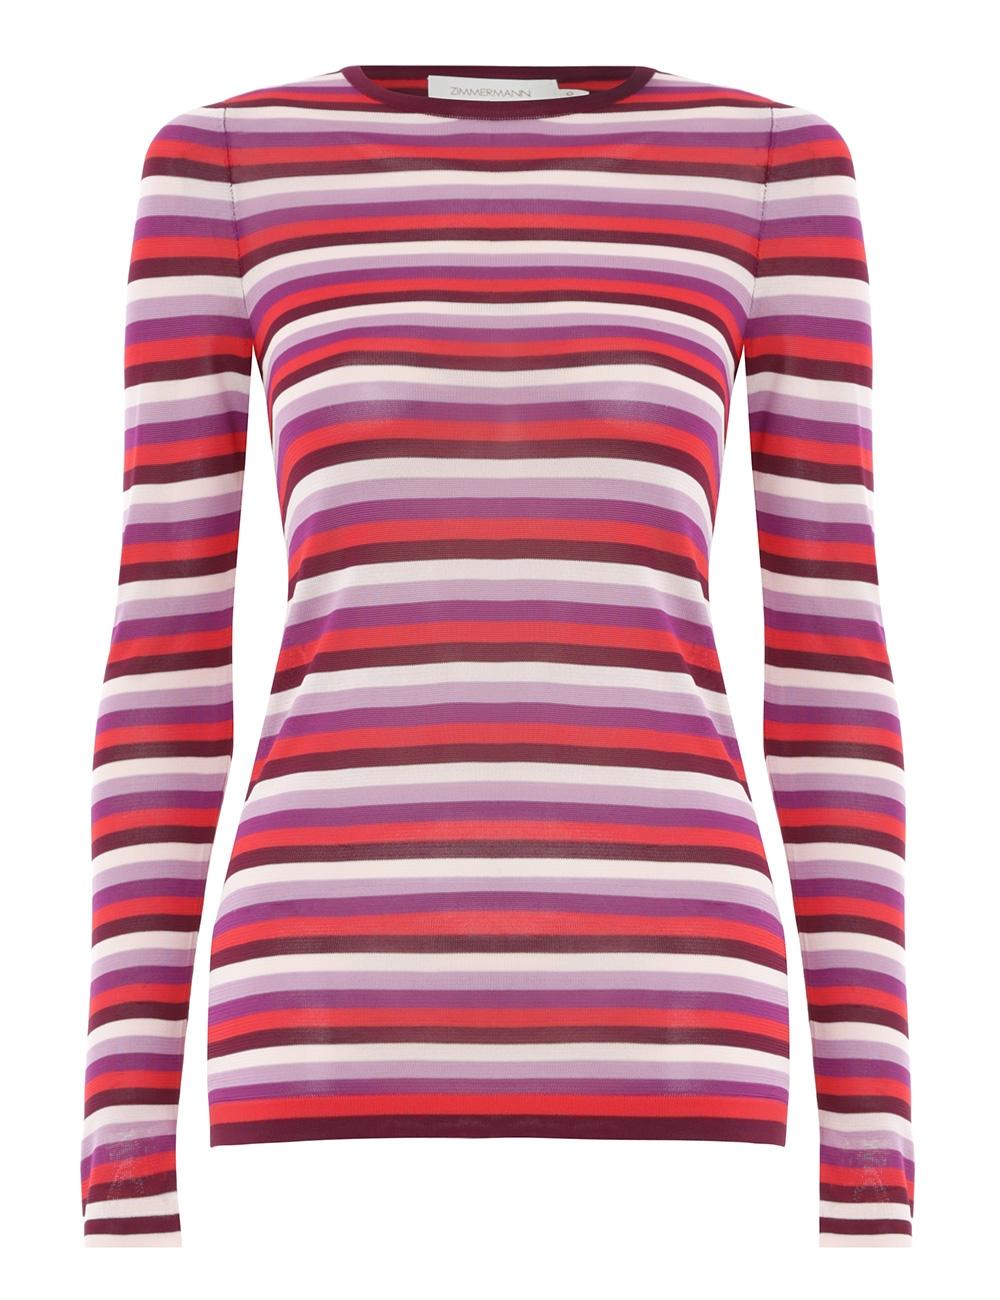 Ninety-Six Long Sleeve Top